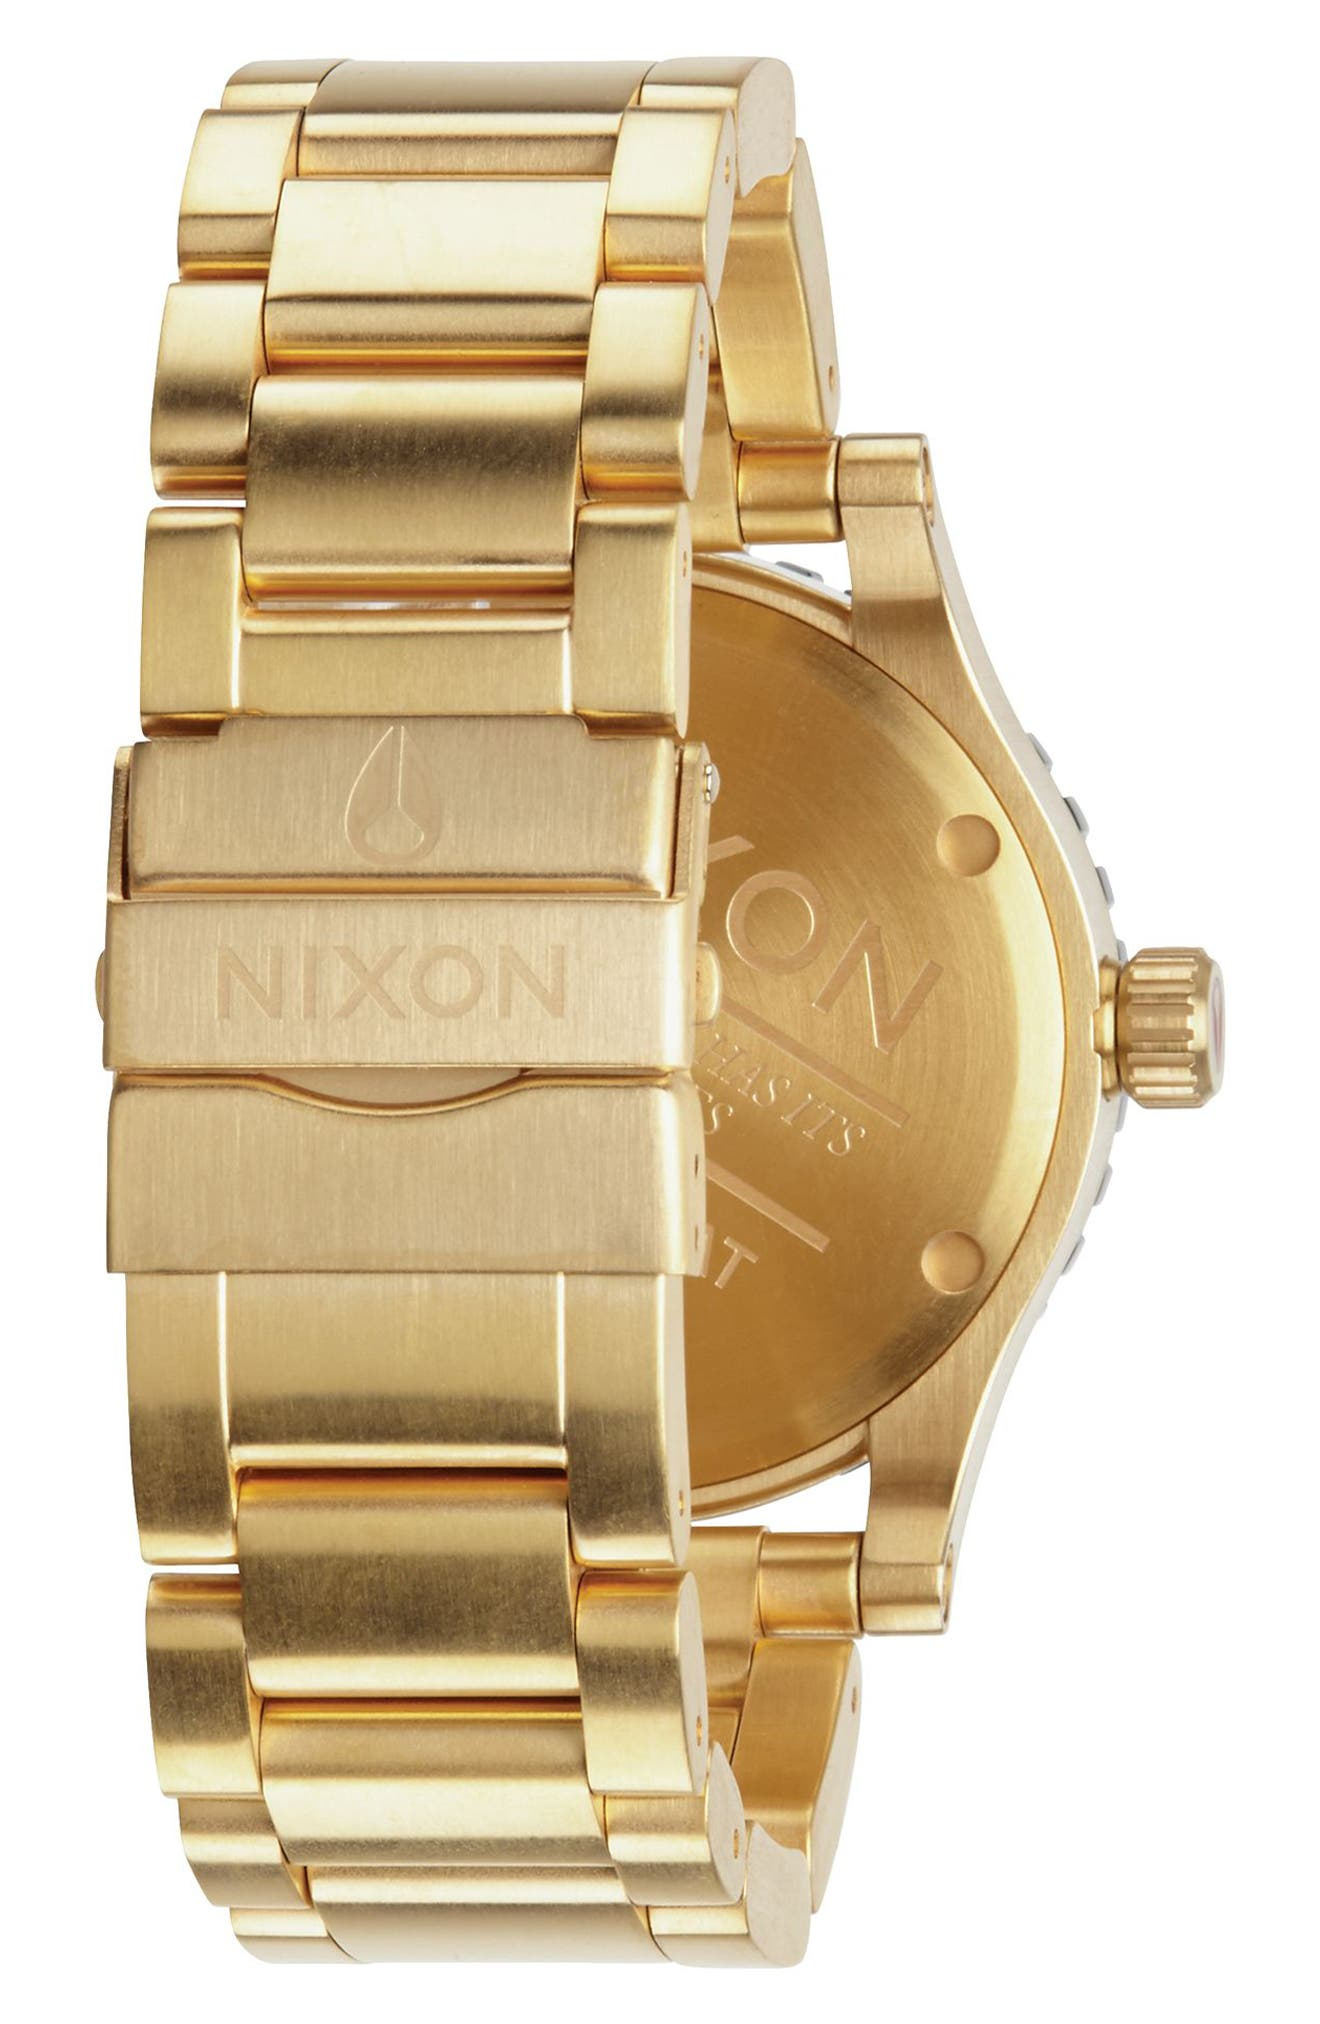 Alternate Image 2  - Nixon The Diplomat Bracelet Watch, 45mm